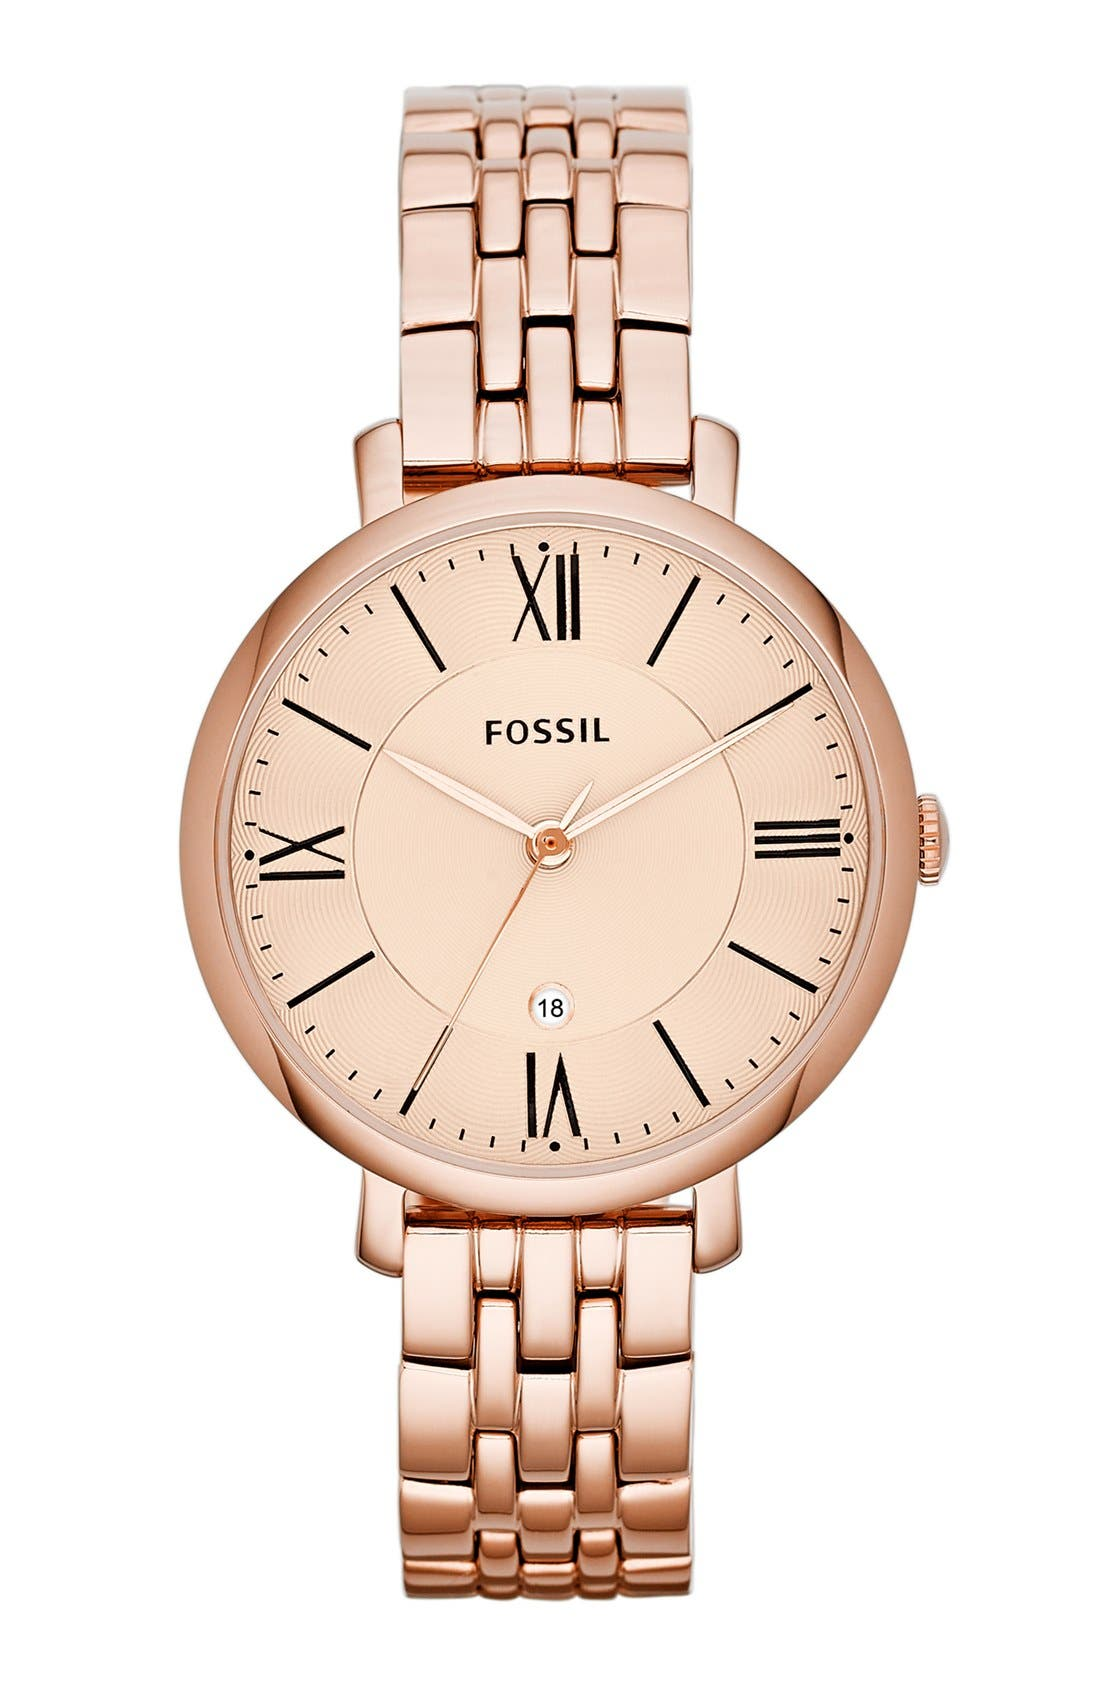 FOSSIL, 'Jacqueline' Round Bracelet Watch, 36mm, Main thumbnail 1, color, ROSE GOLD